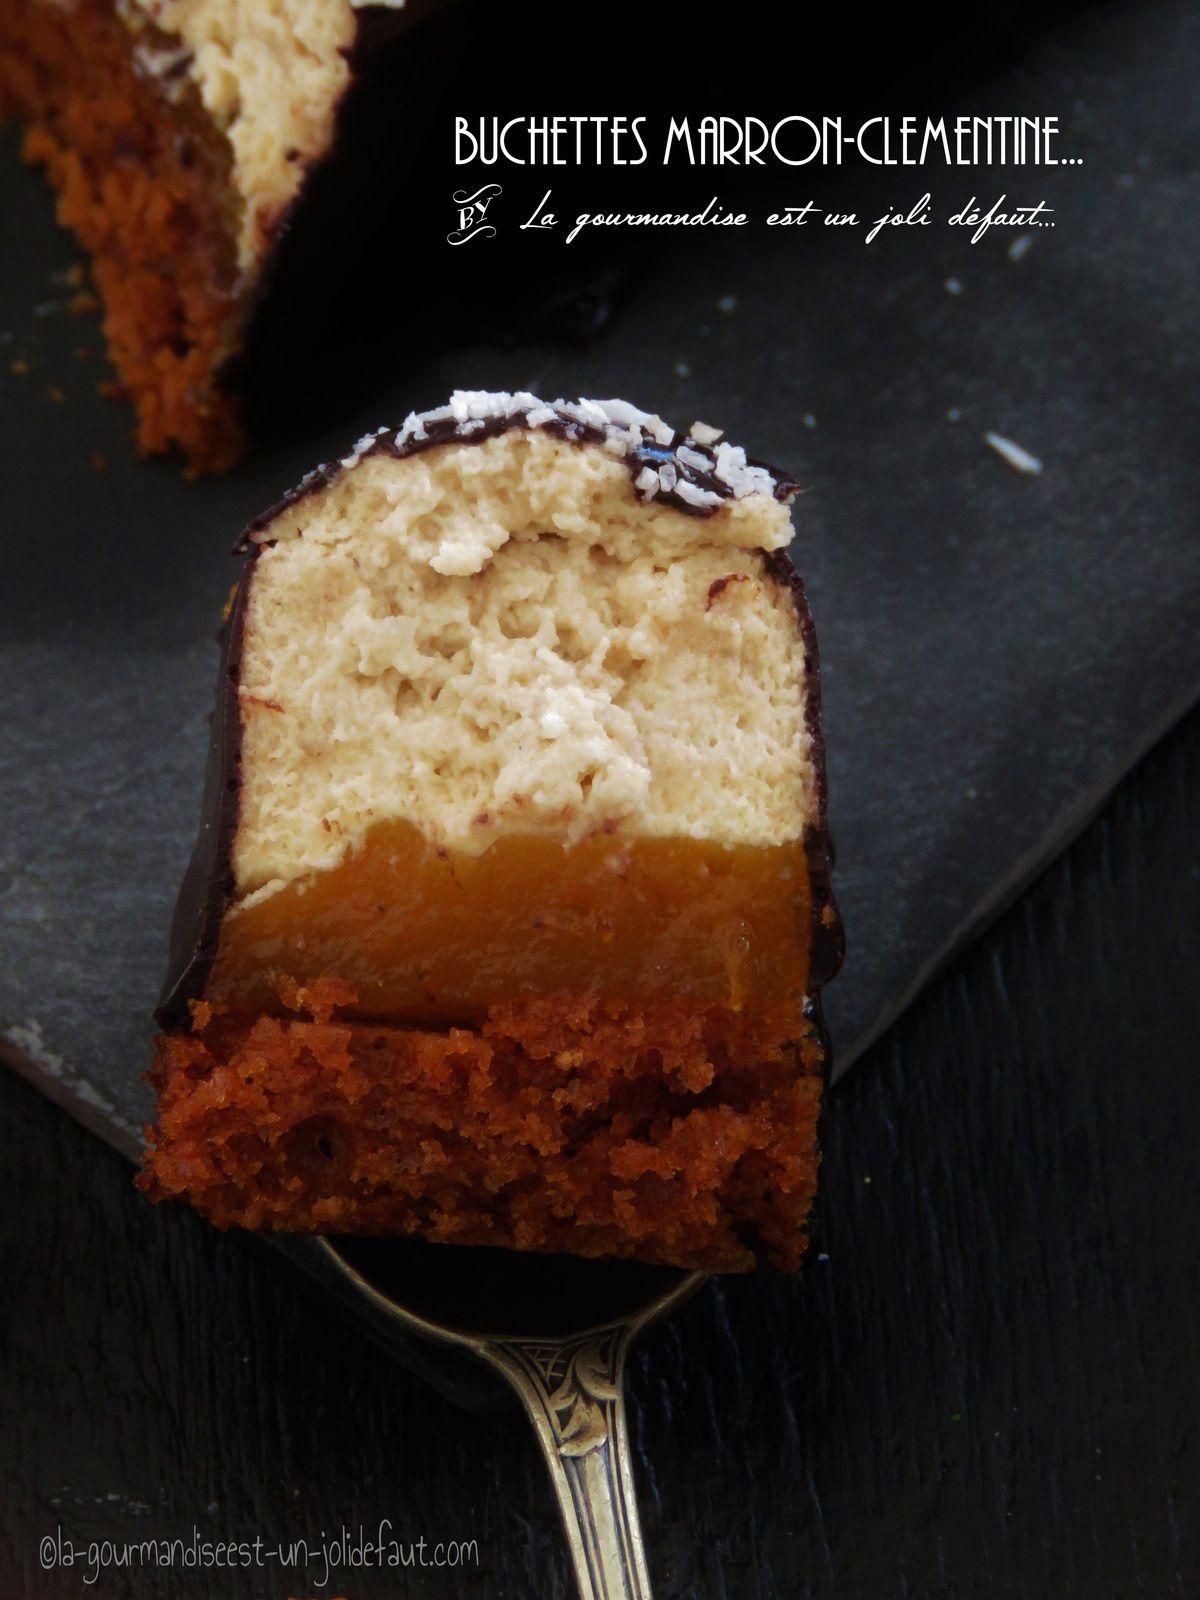 Buchettes marron-clémentine